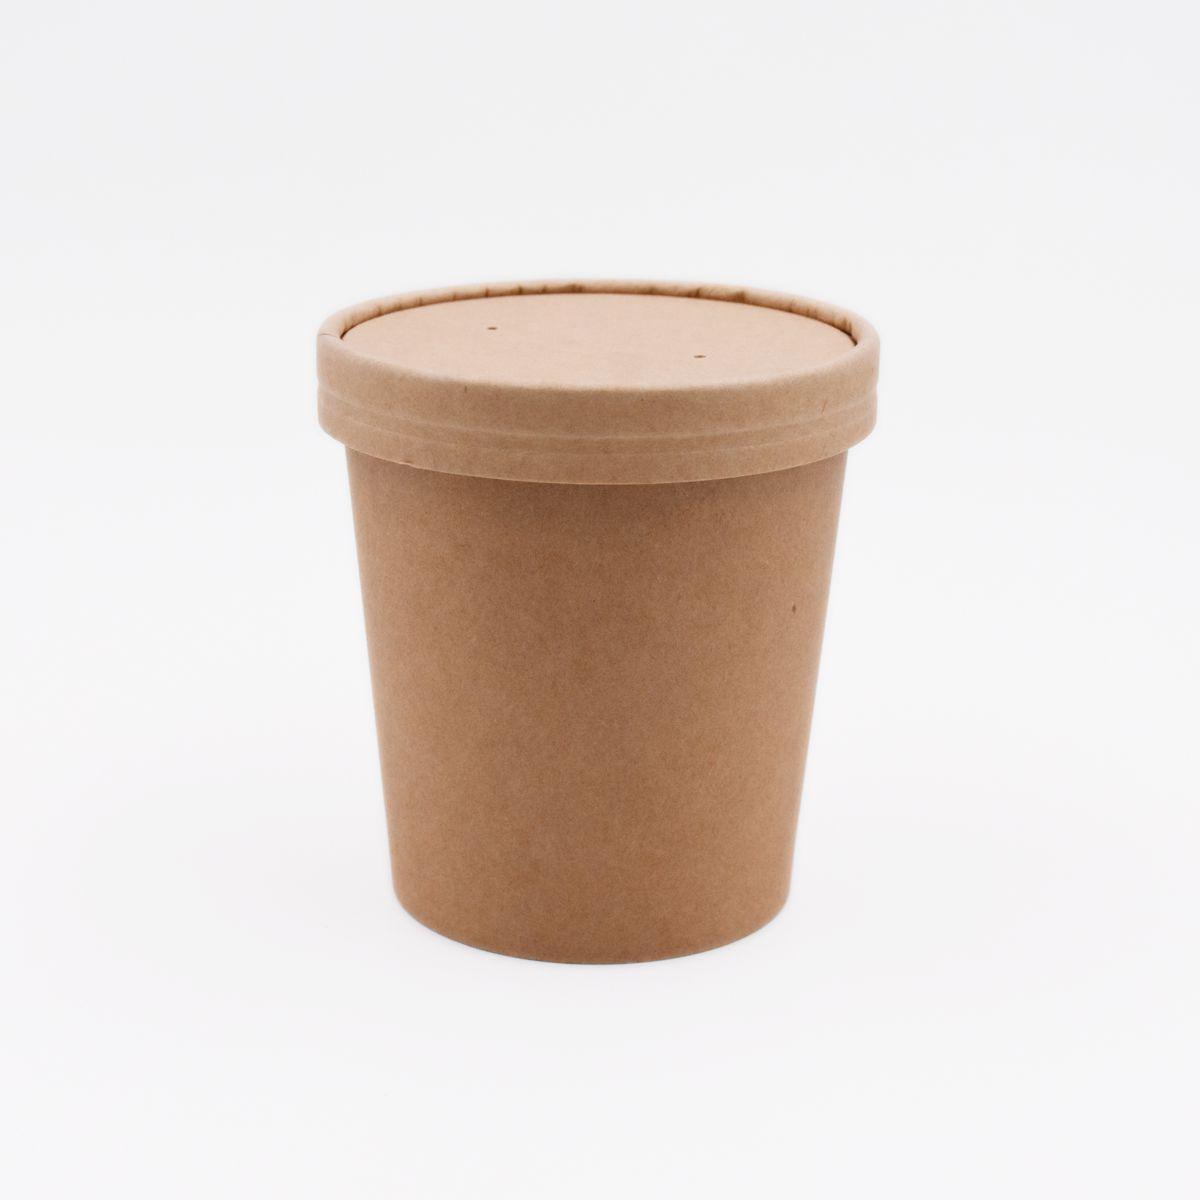 Супник еко-крафт, паперової кришкою, 360 мл, 25 шт/уп.